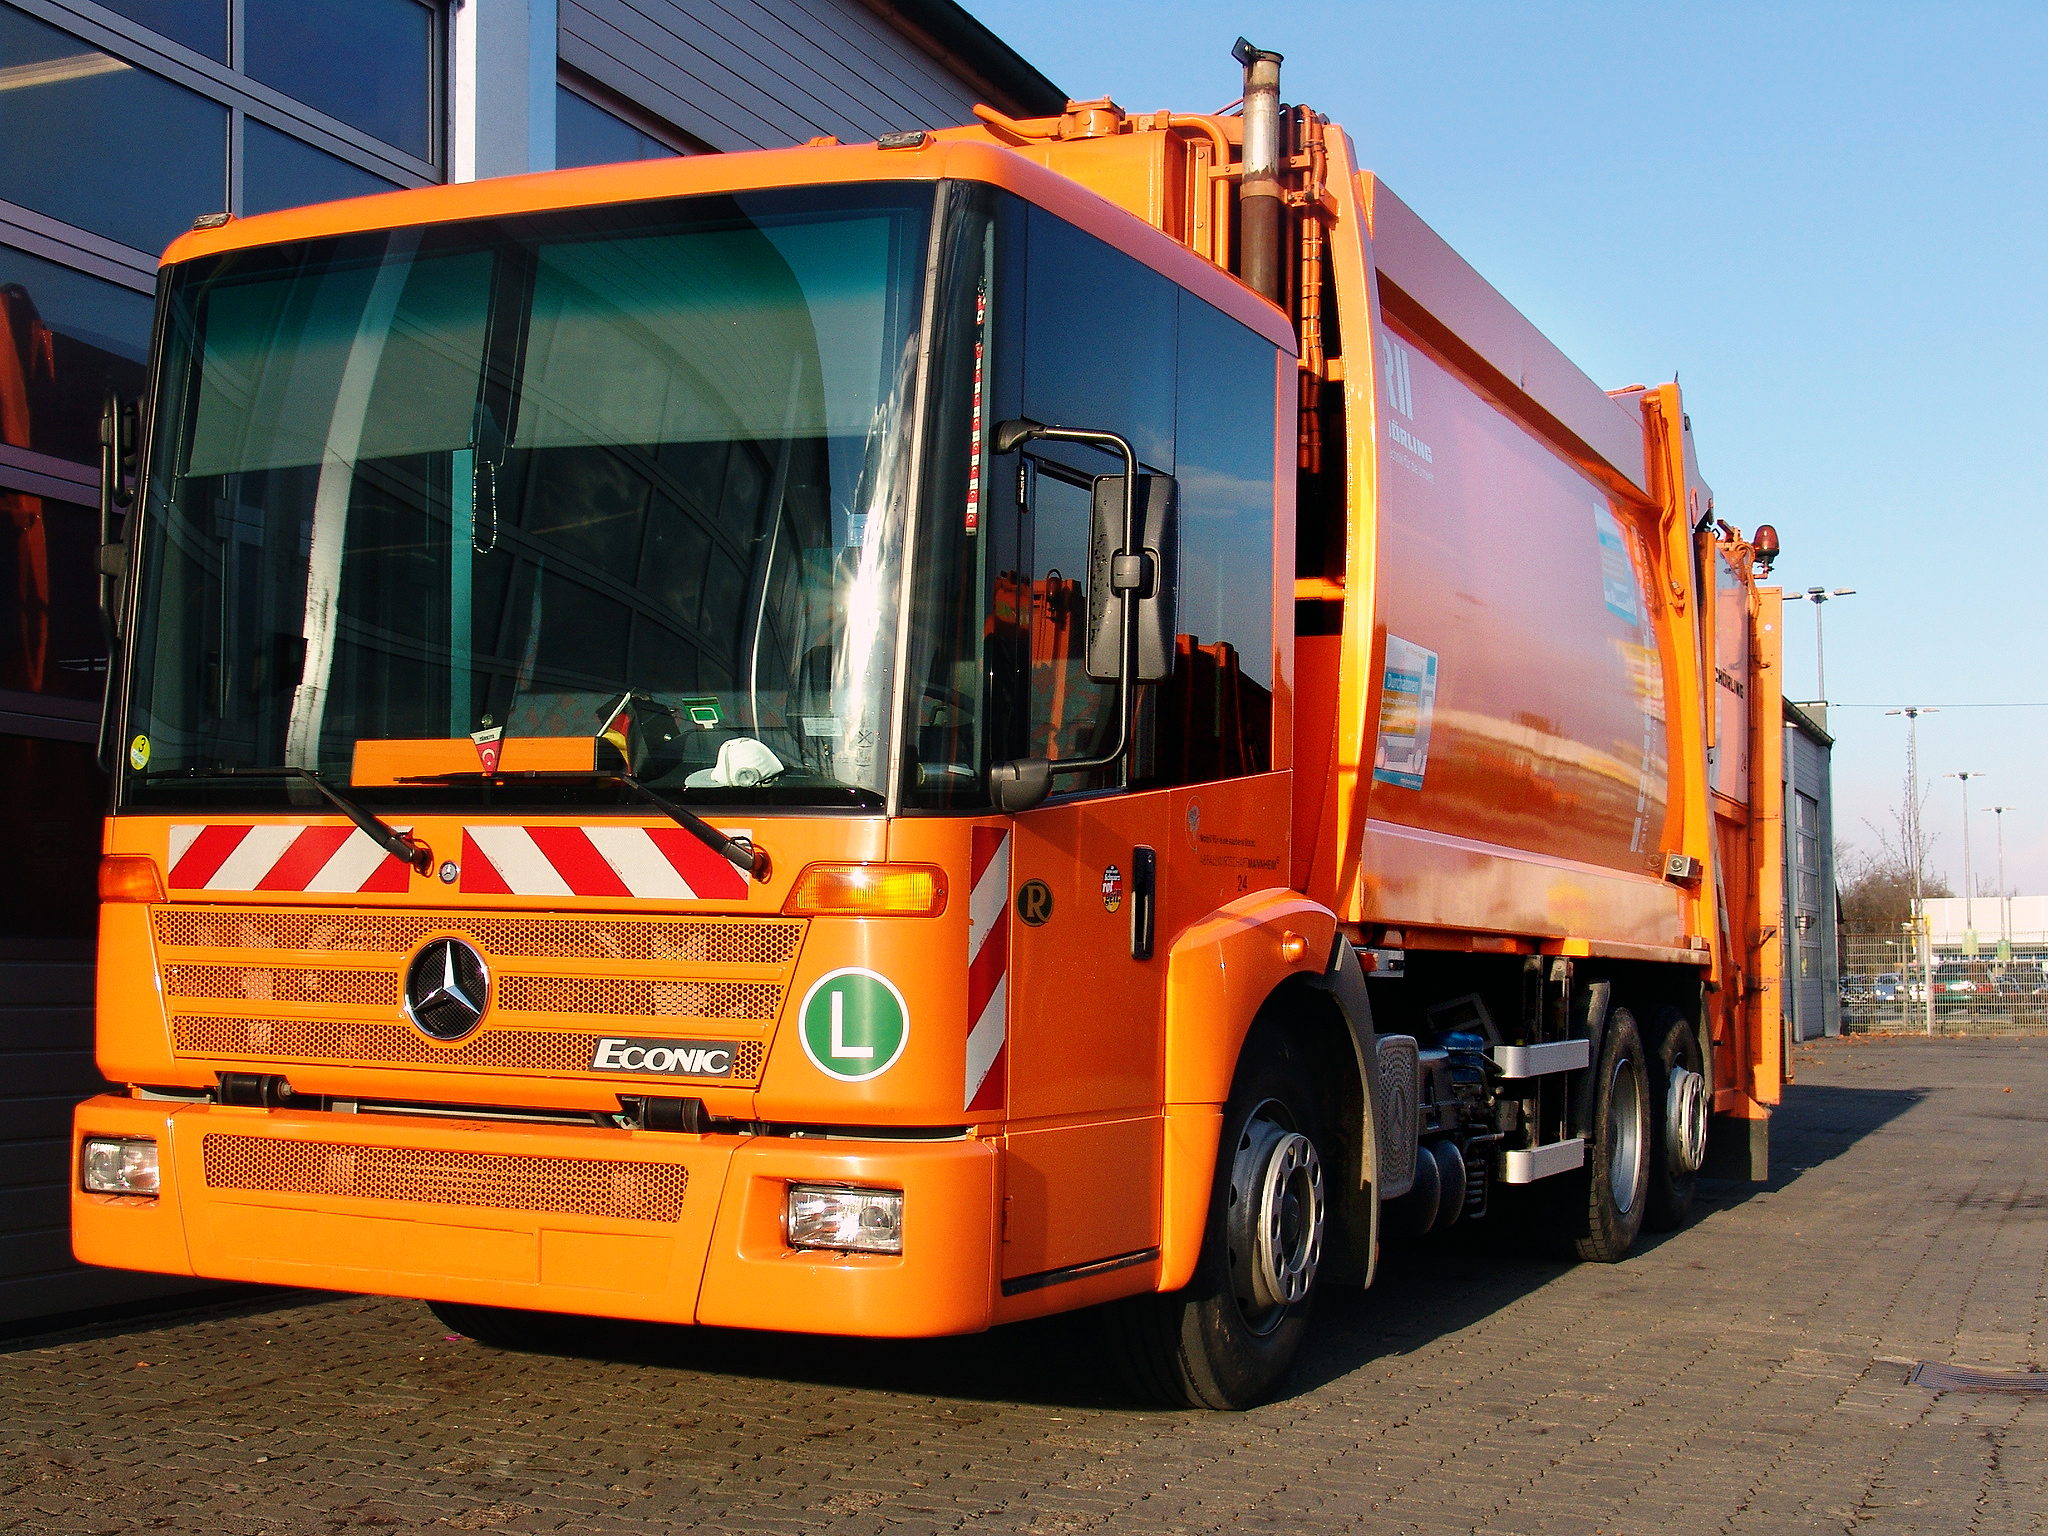 Mercedes Benz Econic garbage truck